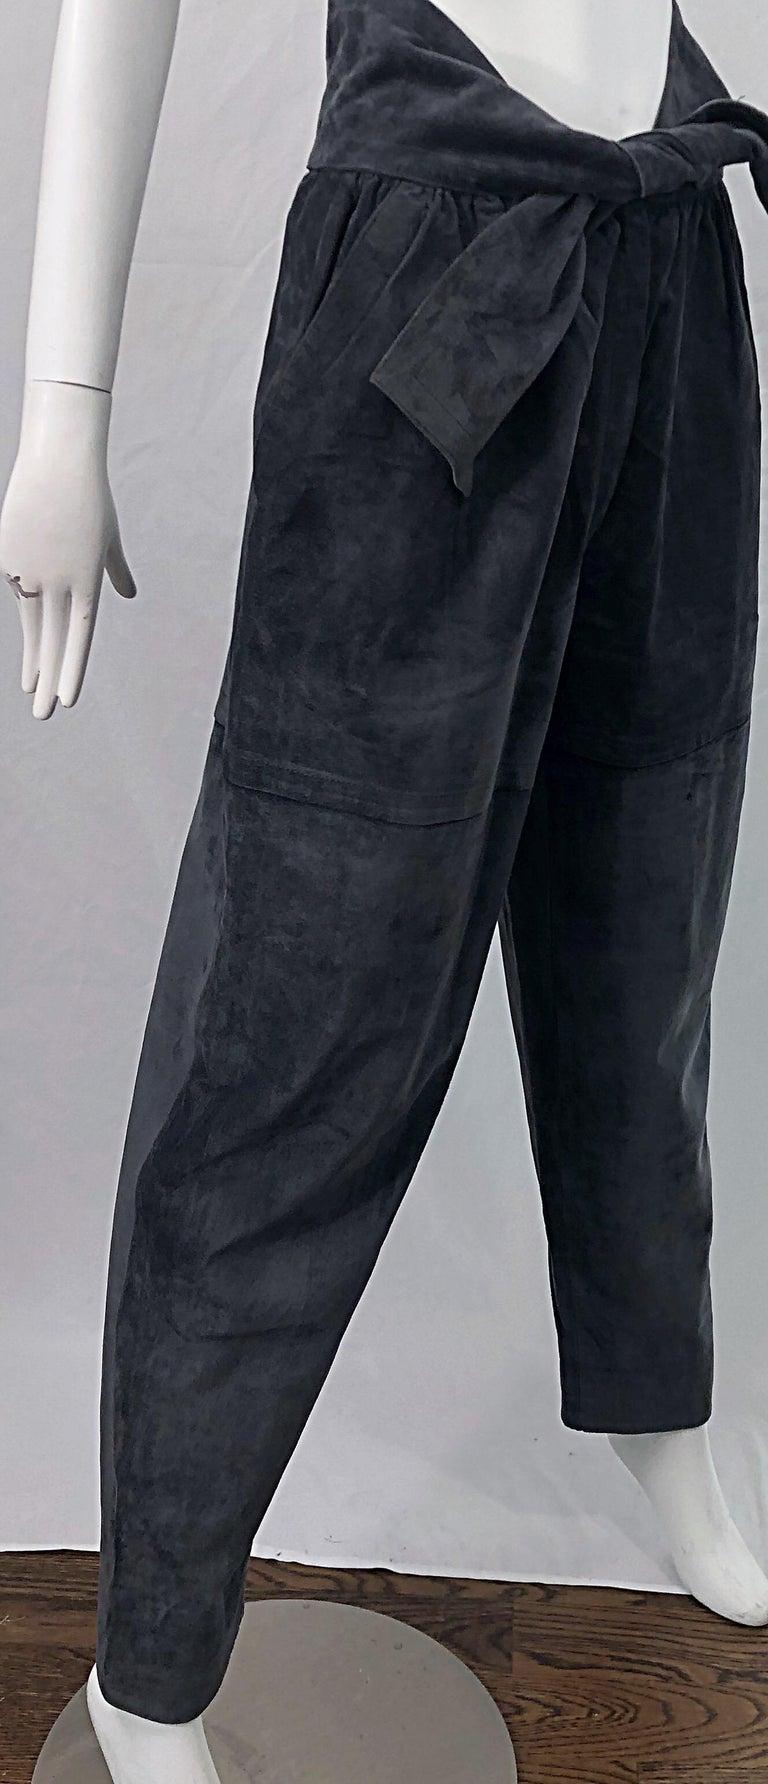 Black Vintage Yves Saint Laurent YSL 1980s Grey Suede Leather High Waisted Harem Pants For Sale